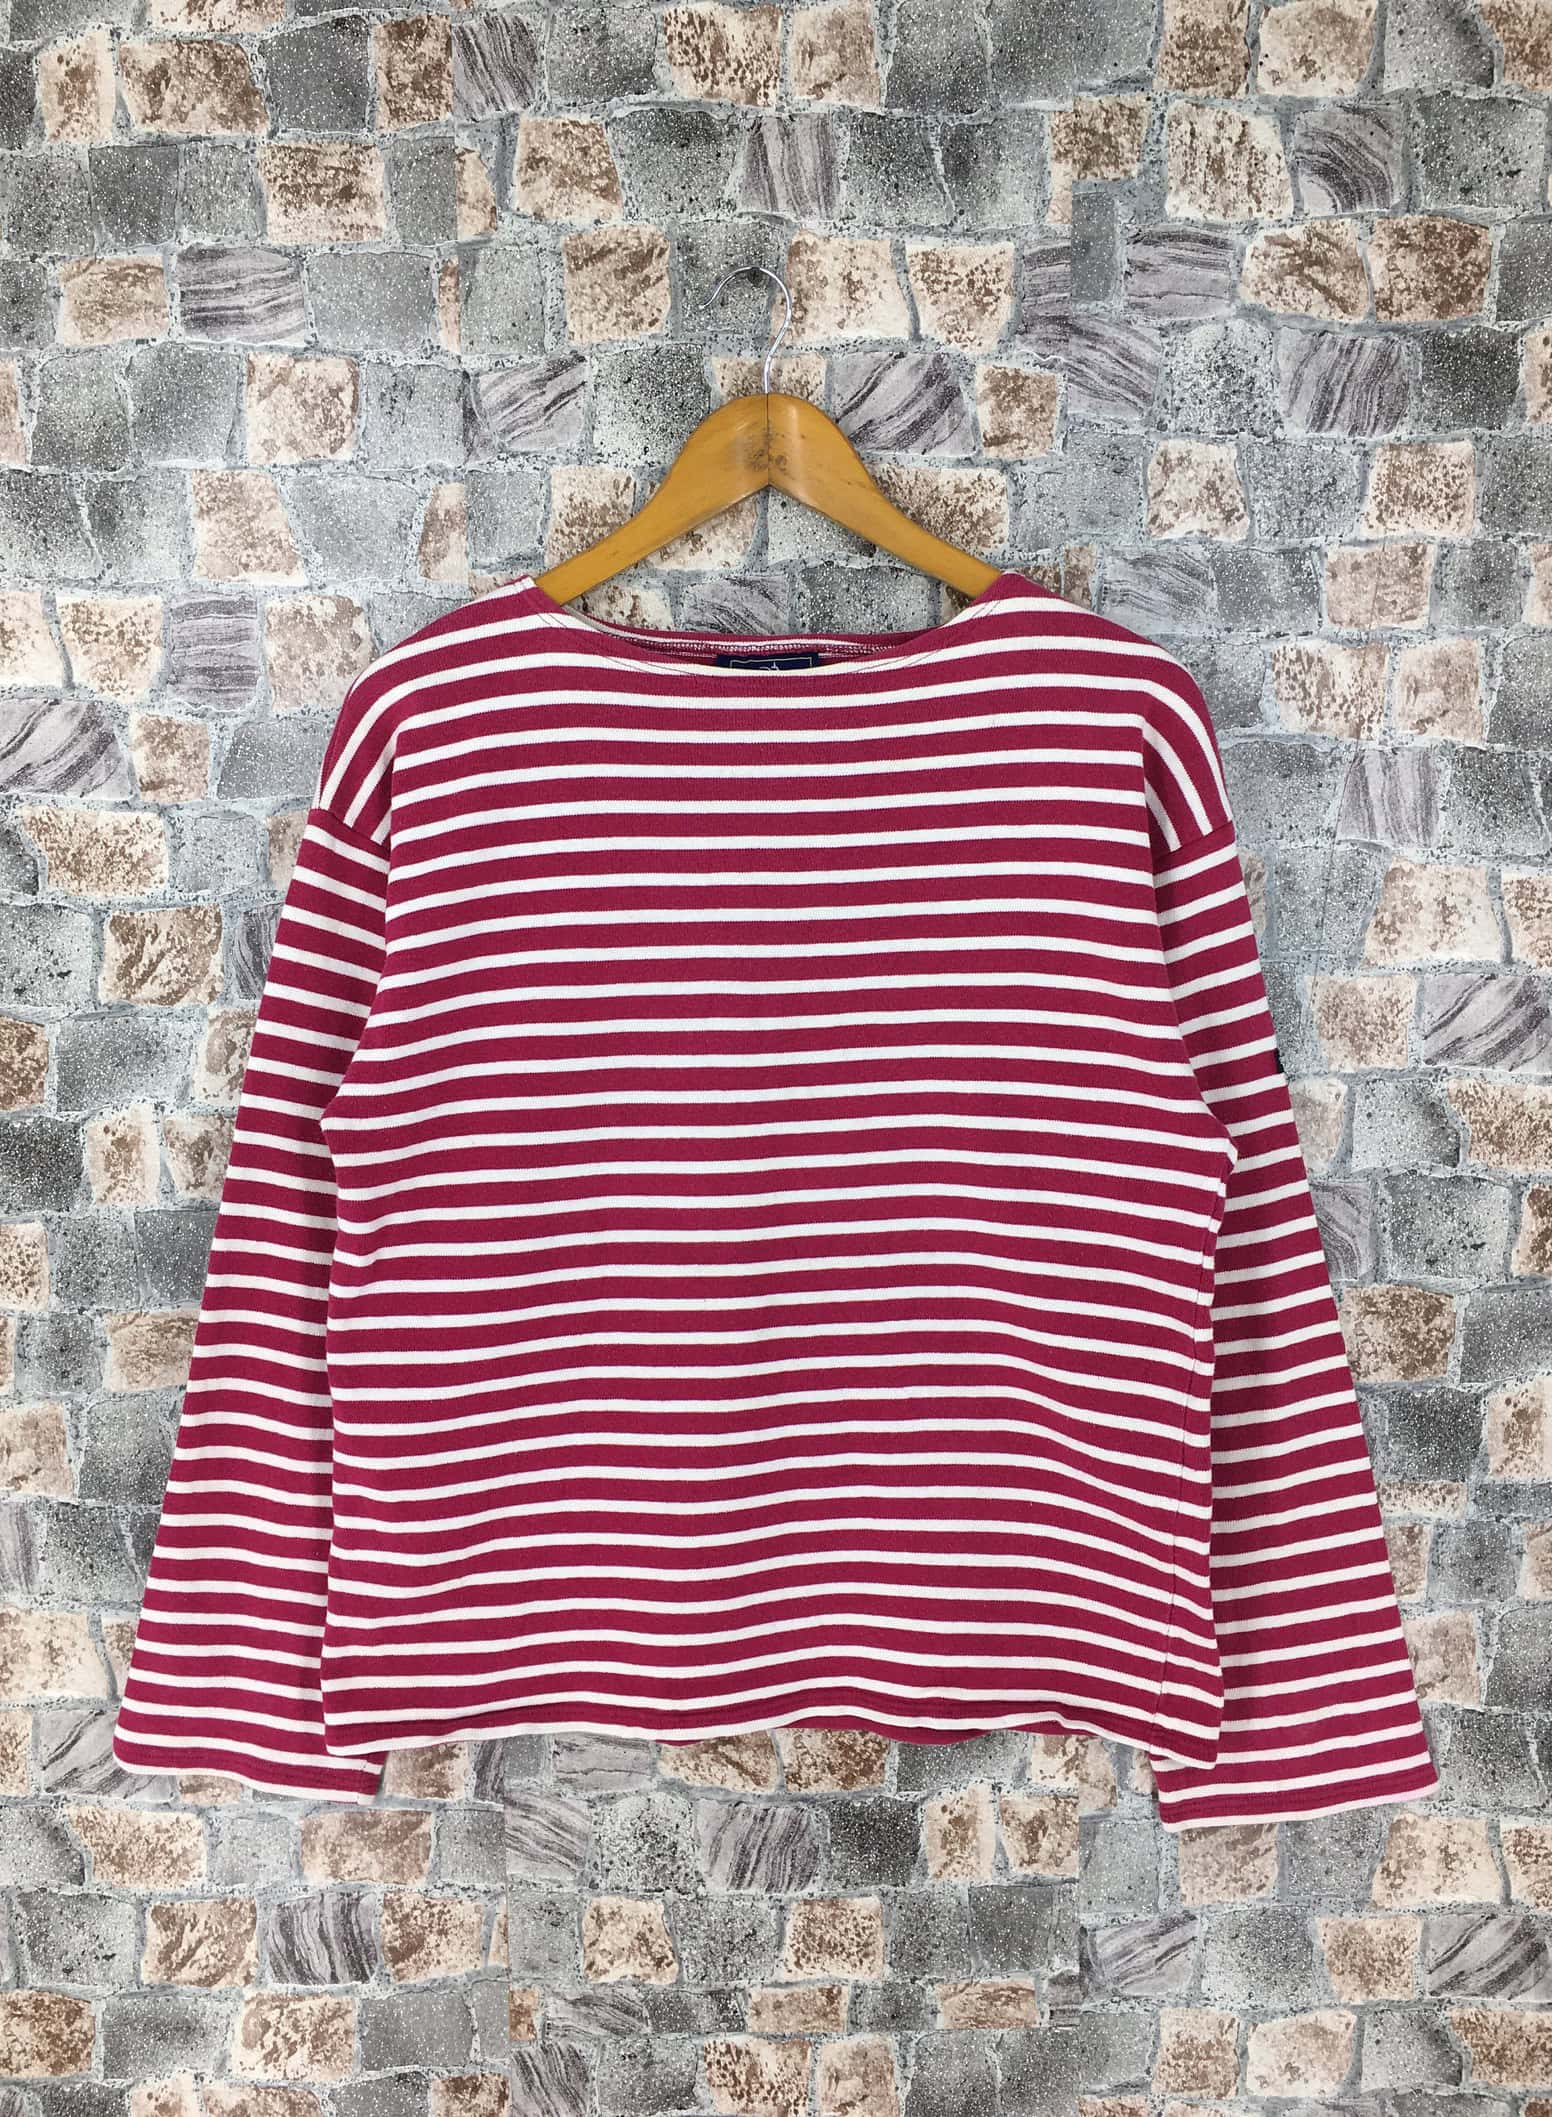 Vintage 90's Saint James France Stripes Shirt Small Stripes Border Red:White Striped Longsleeve Shirt Size S